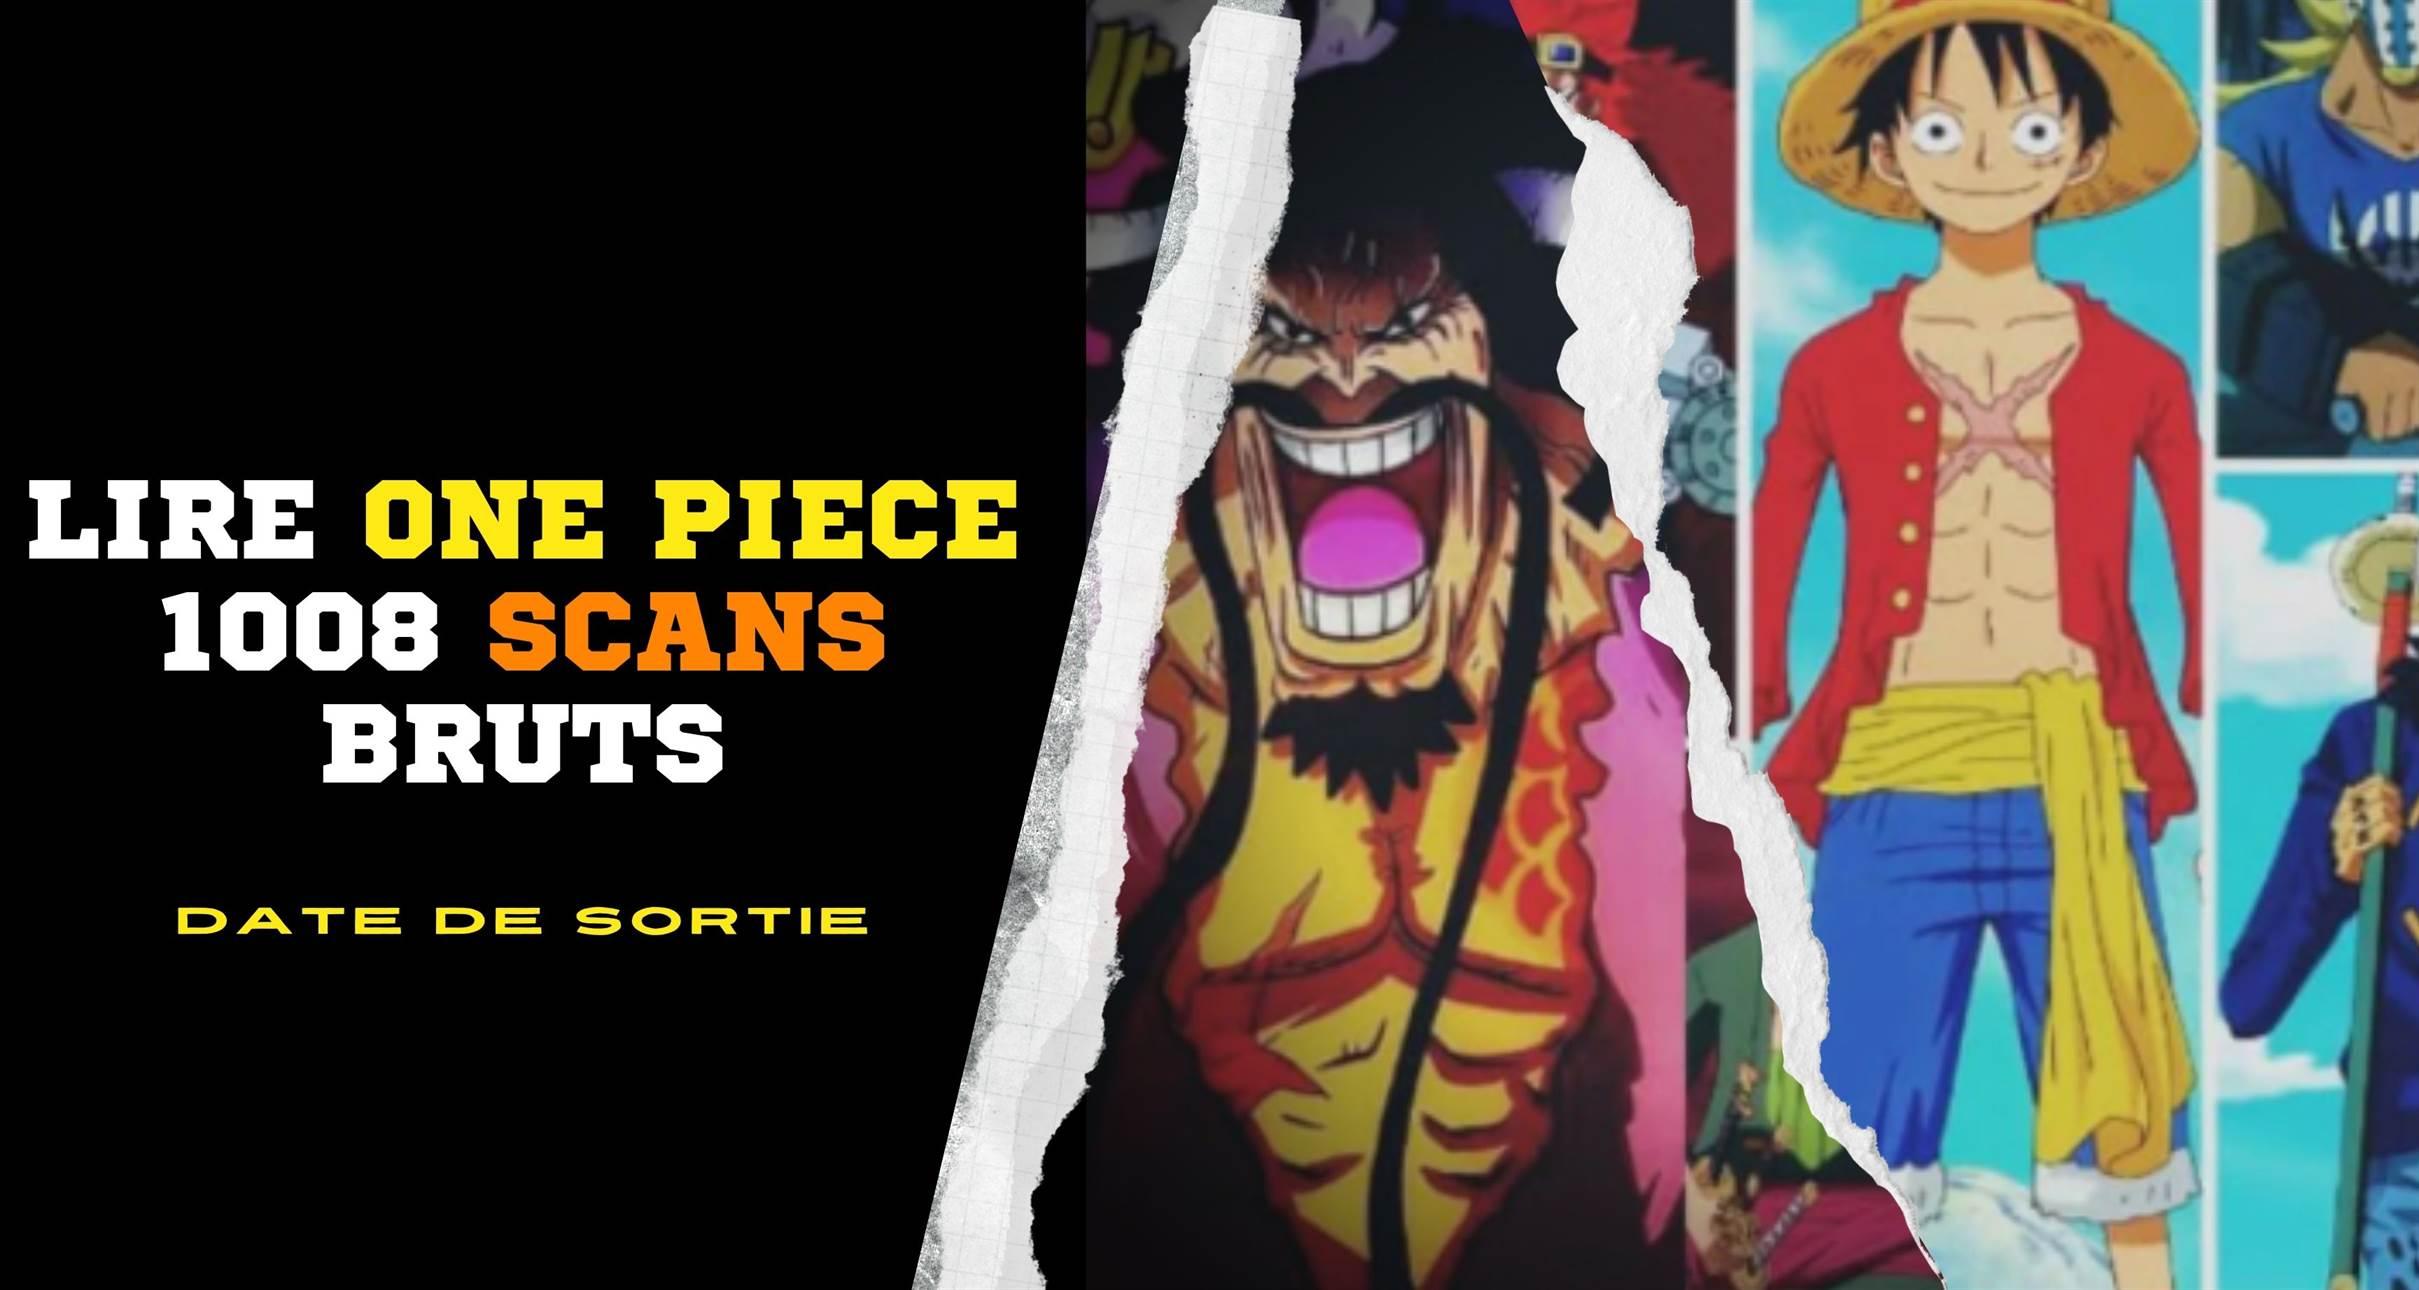 Lire One Piece 1008 Scans bruts